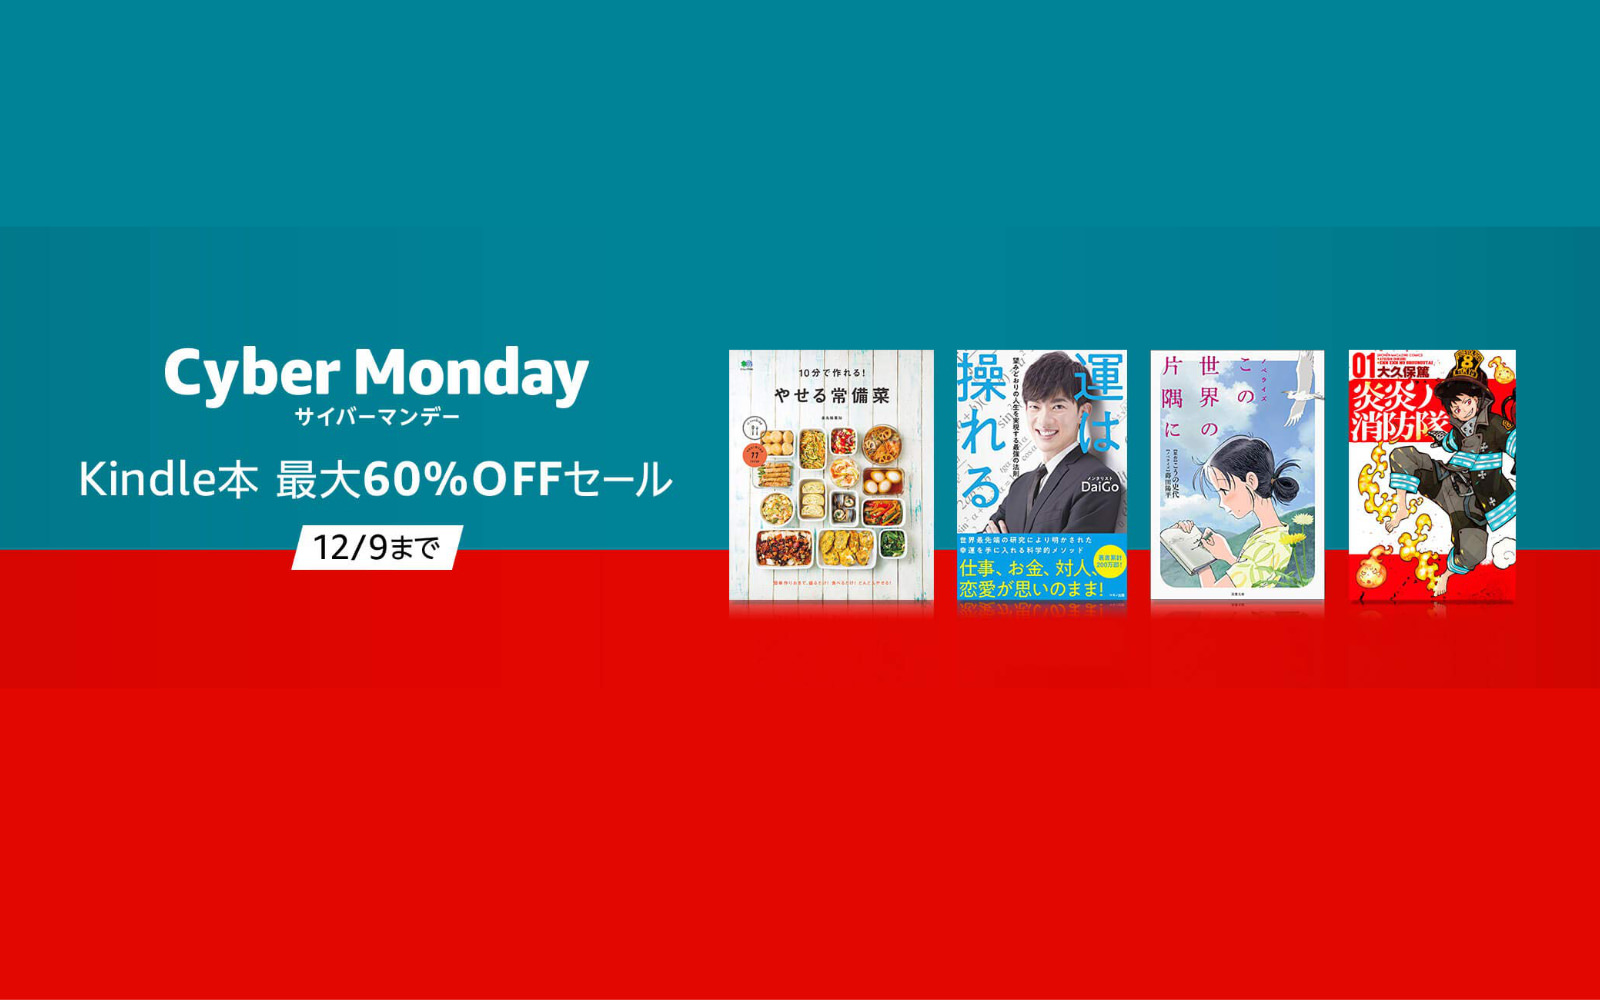 Cybermonday kindle sale